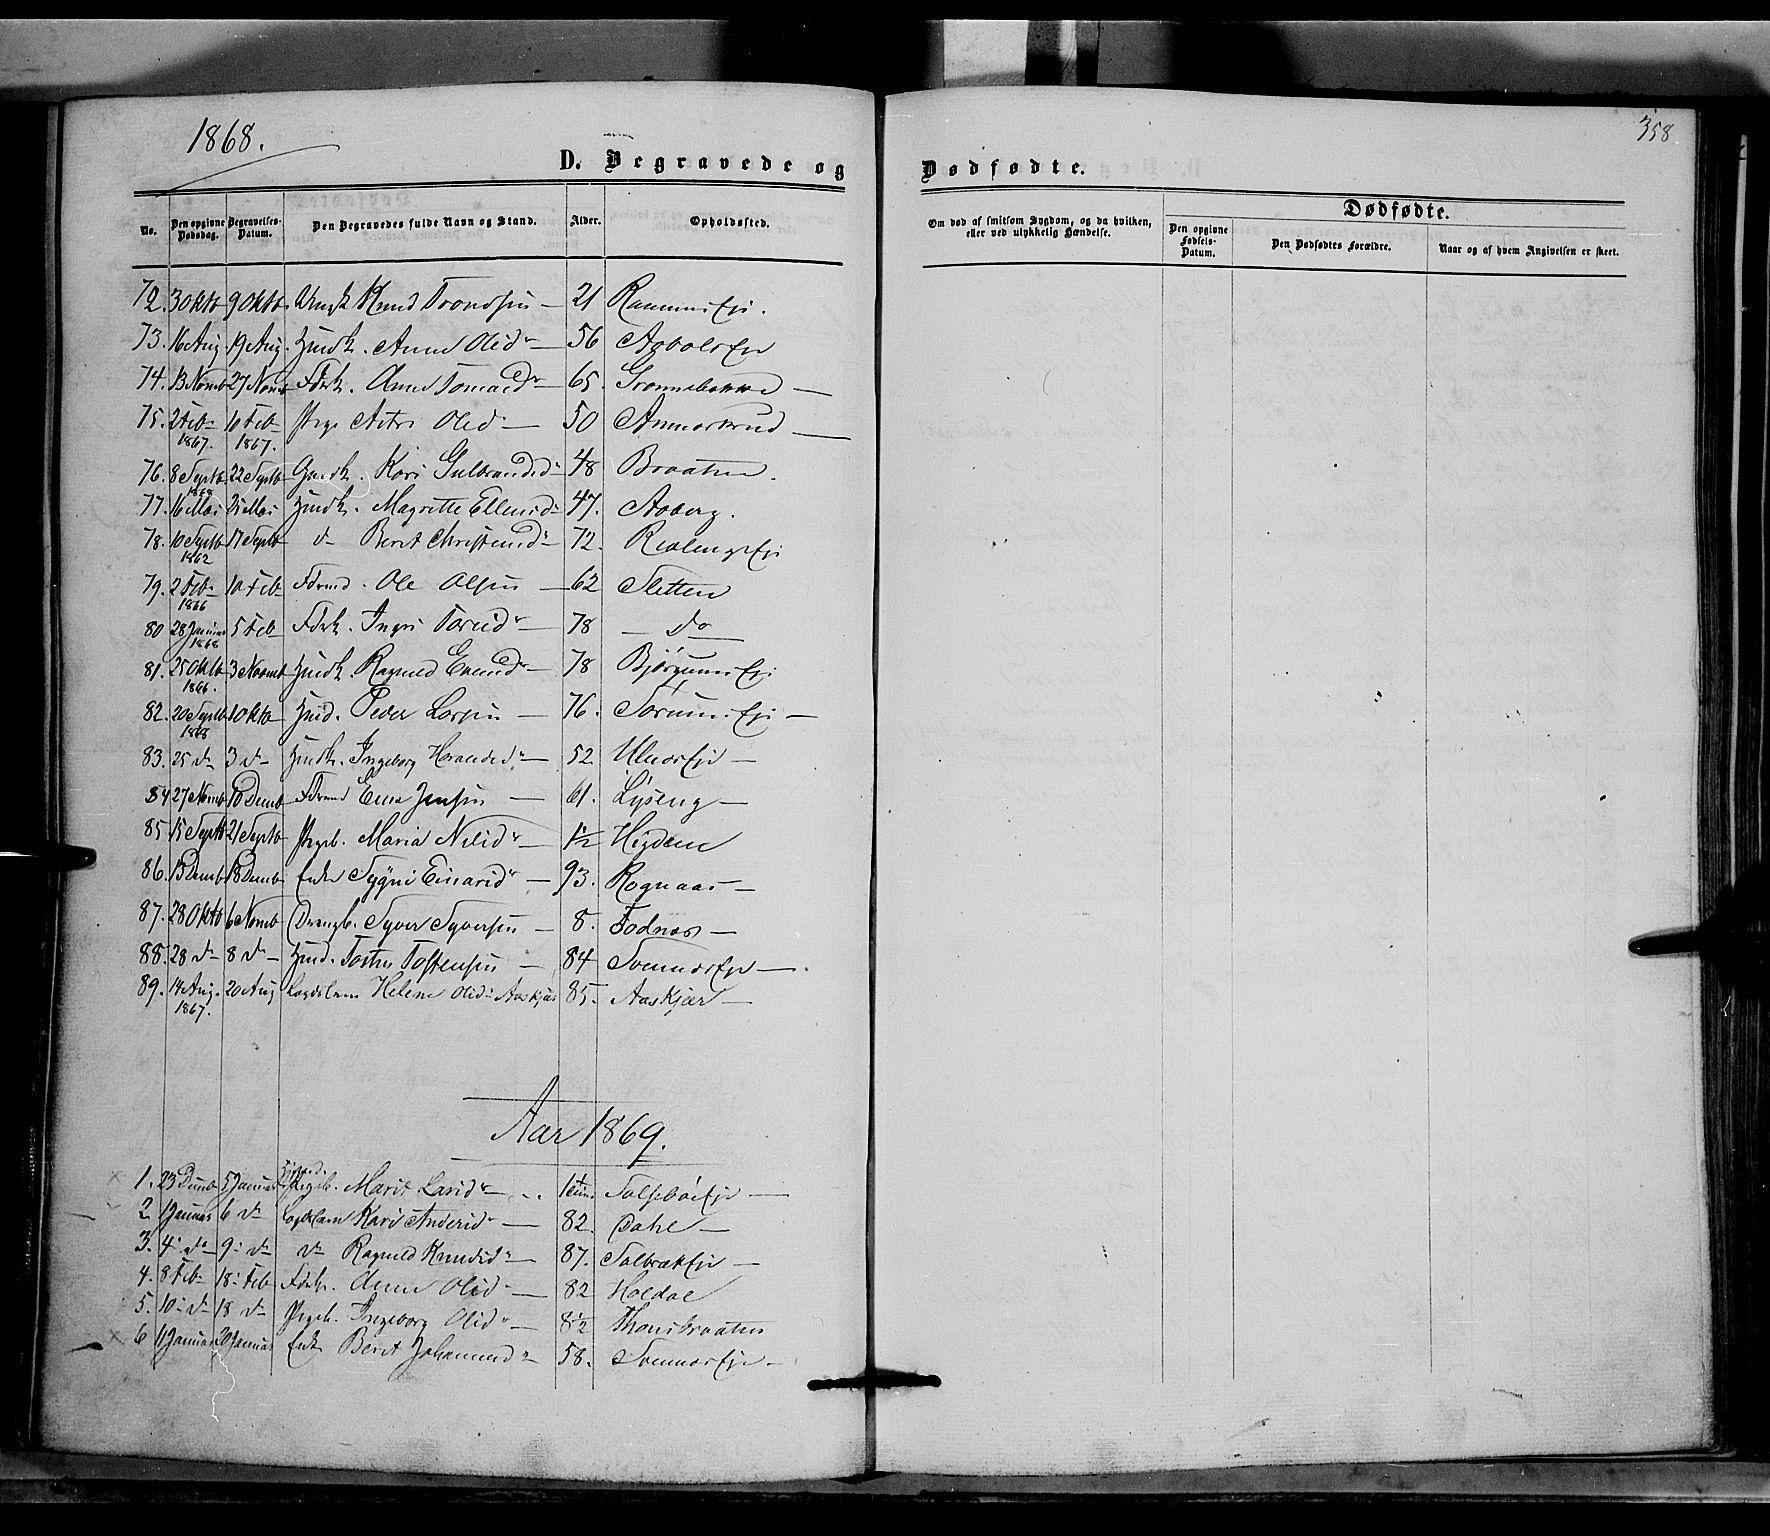 SAH, Nord-Aurdal prestekontor, Ministerialbok nr. 8, 1863-1875, s. 358